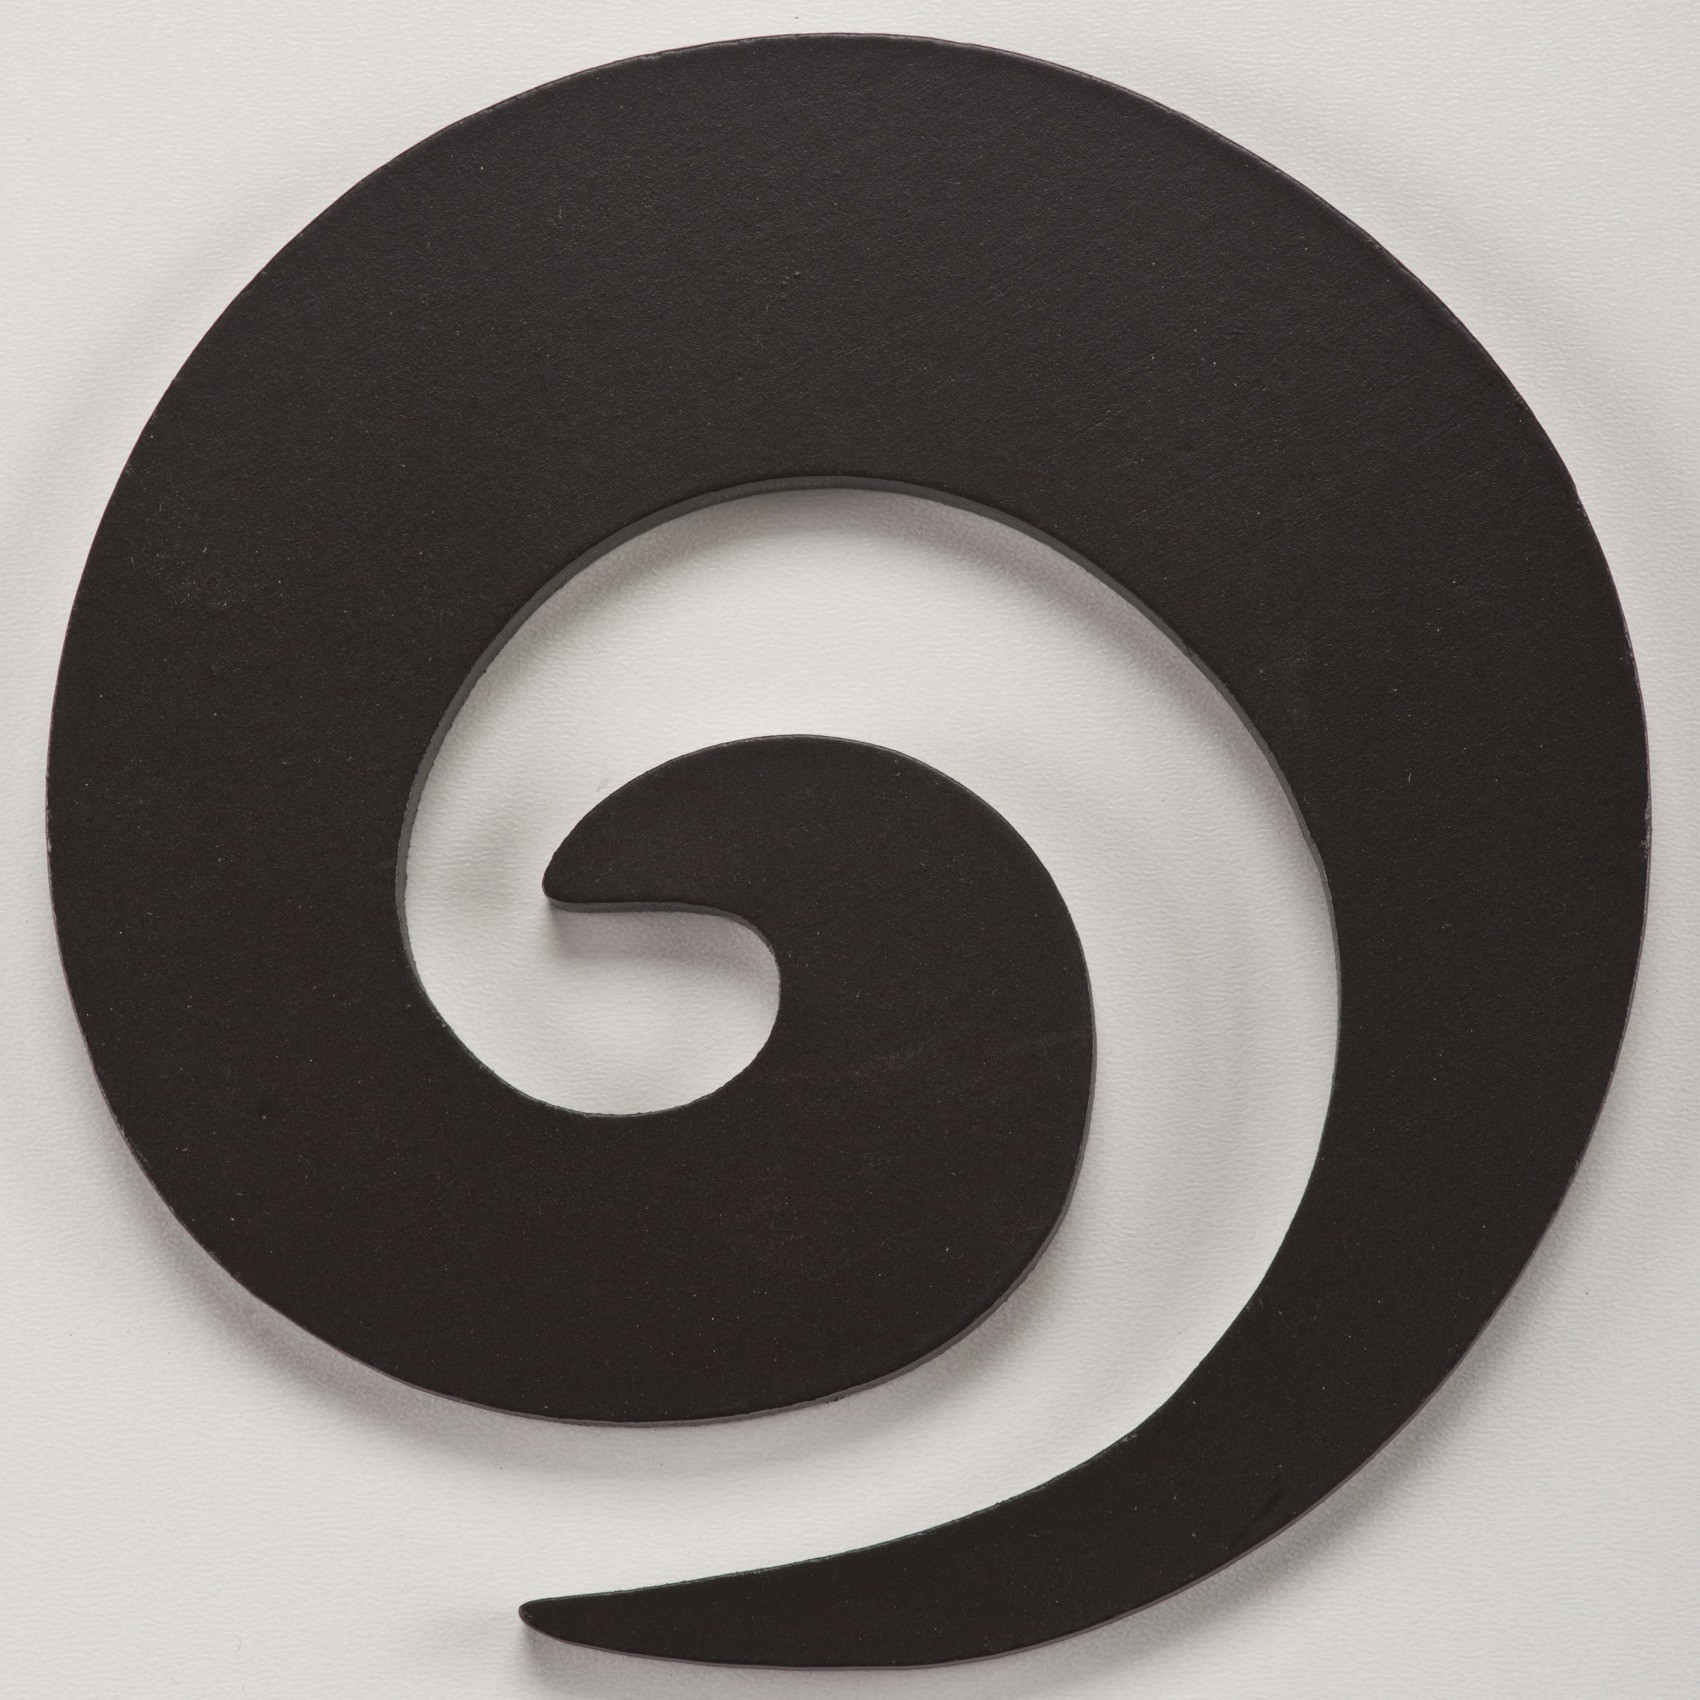 SLIMAK DEKOR 4276 - Brązowy